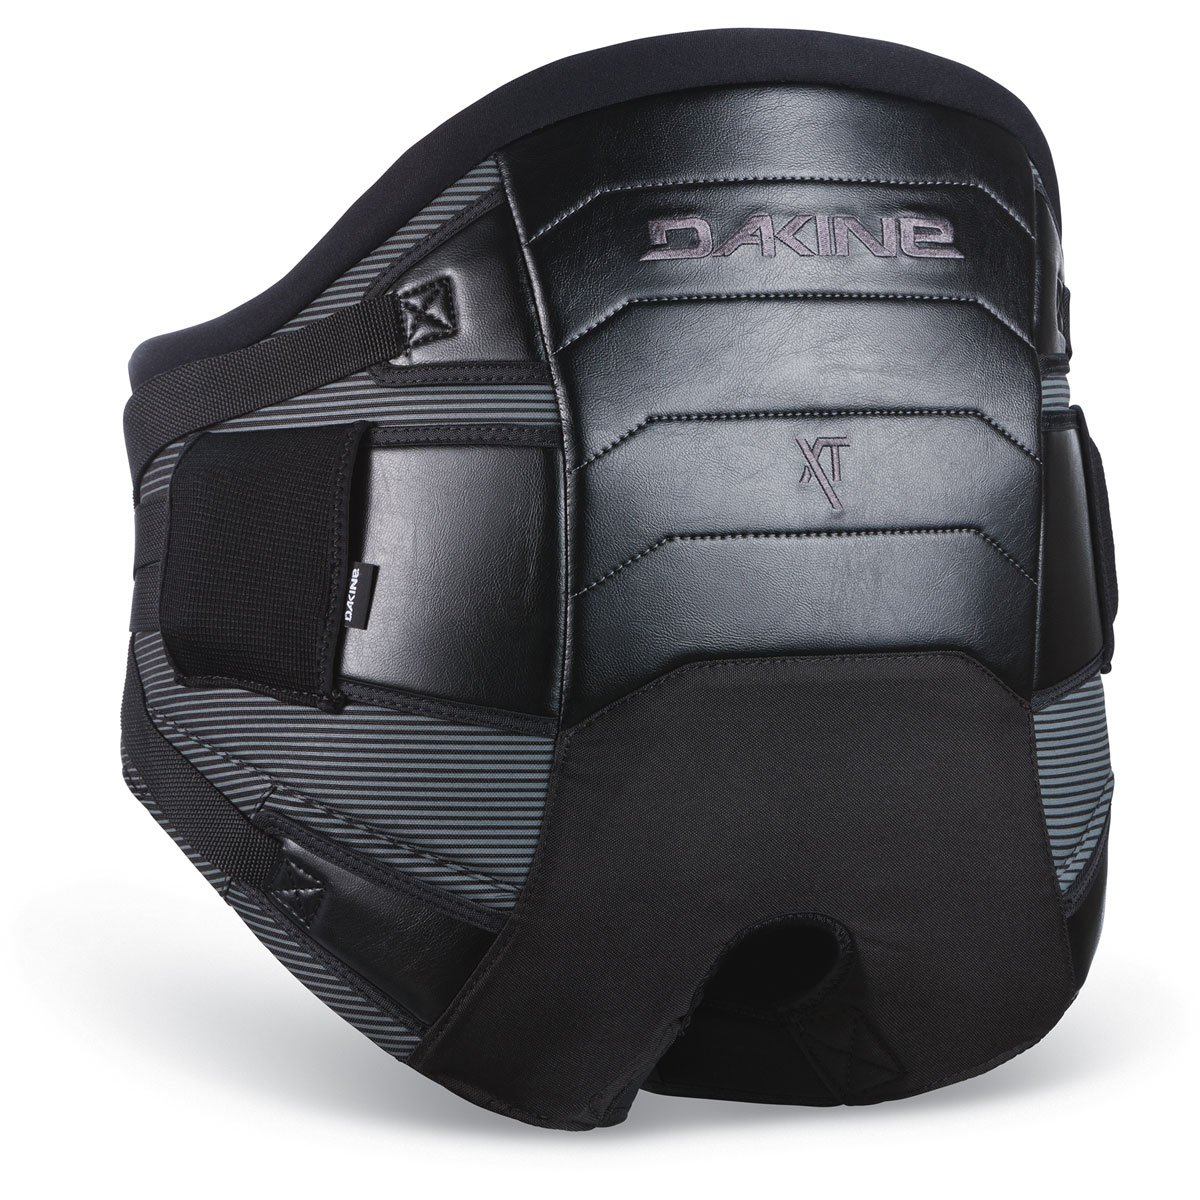 Dakine Men's XT Seat Windsurf Harness, Black, XL by Dakine